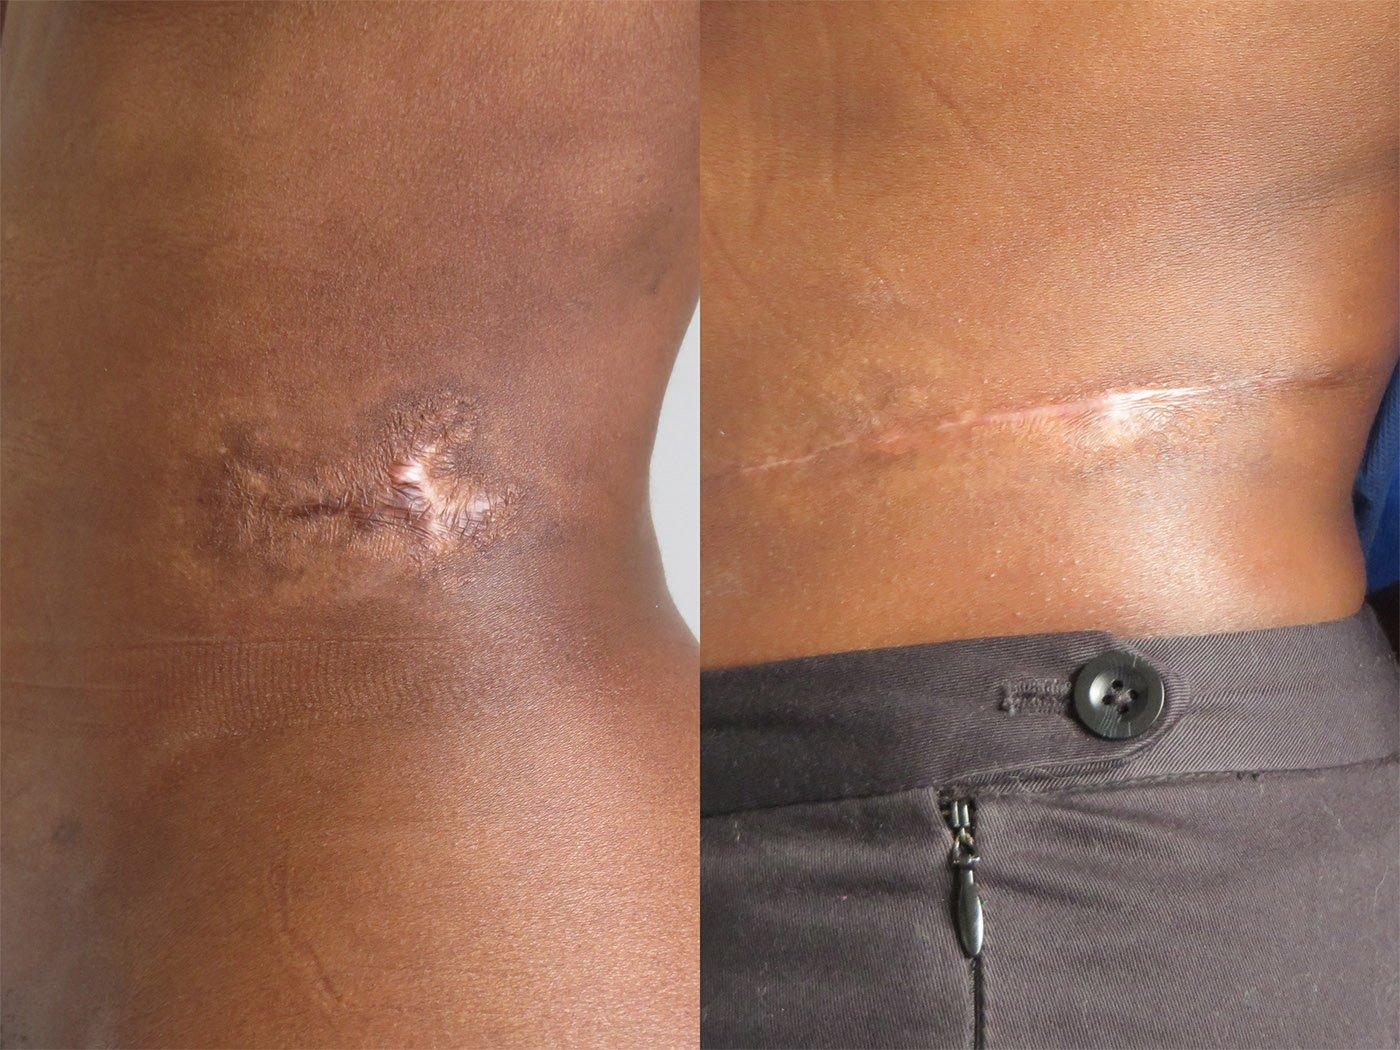 Excision of burn scar